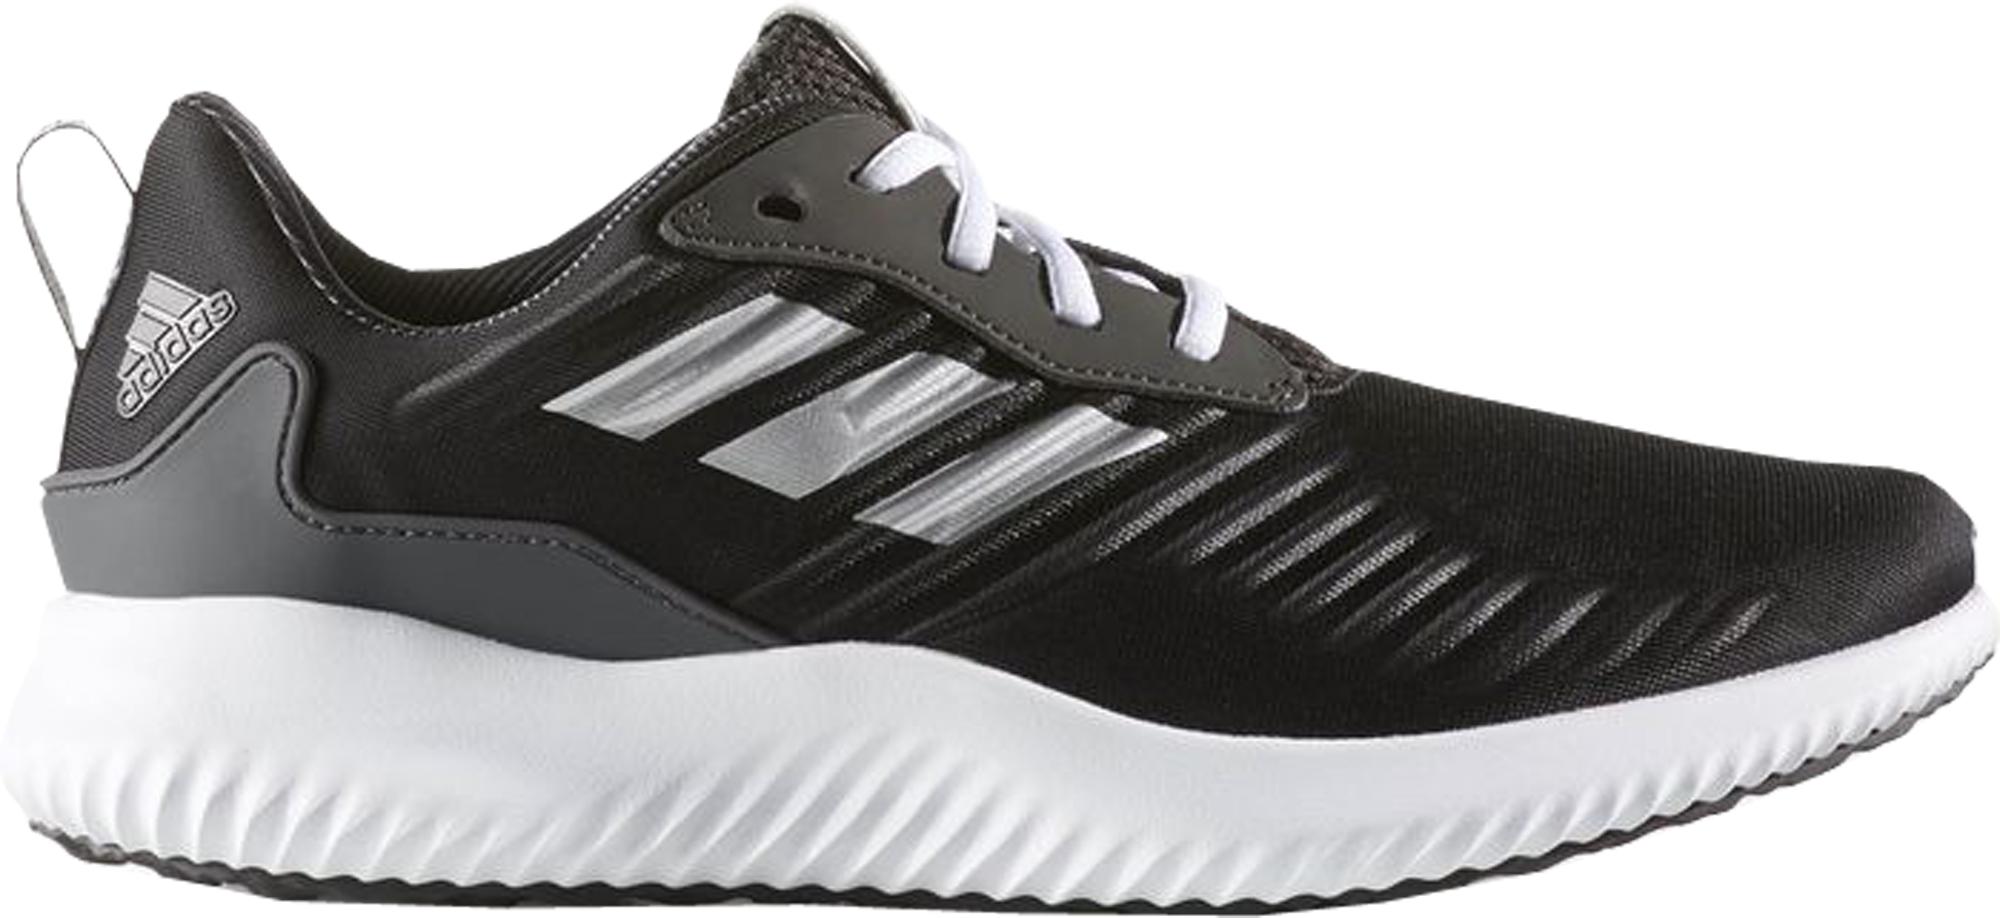 adidas Alphabounce RC Core Black - B42652